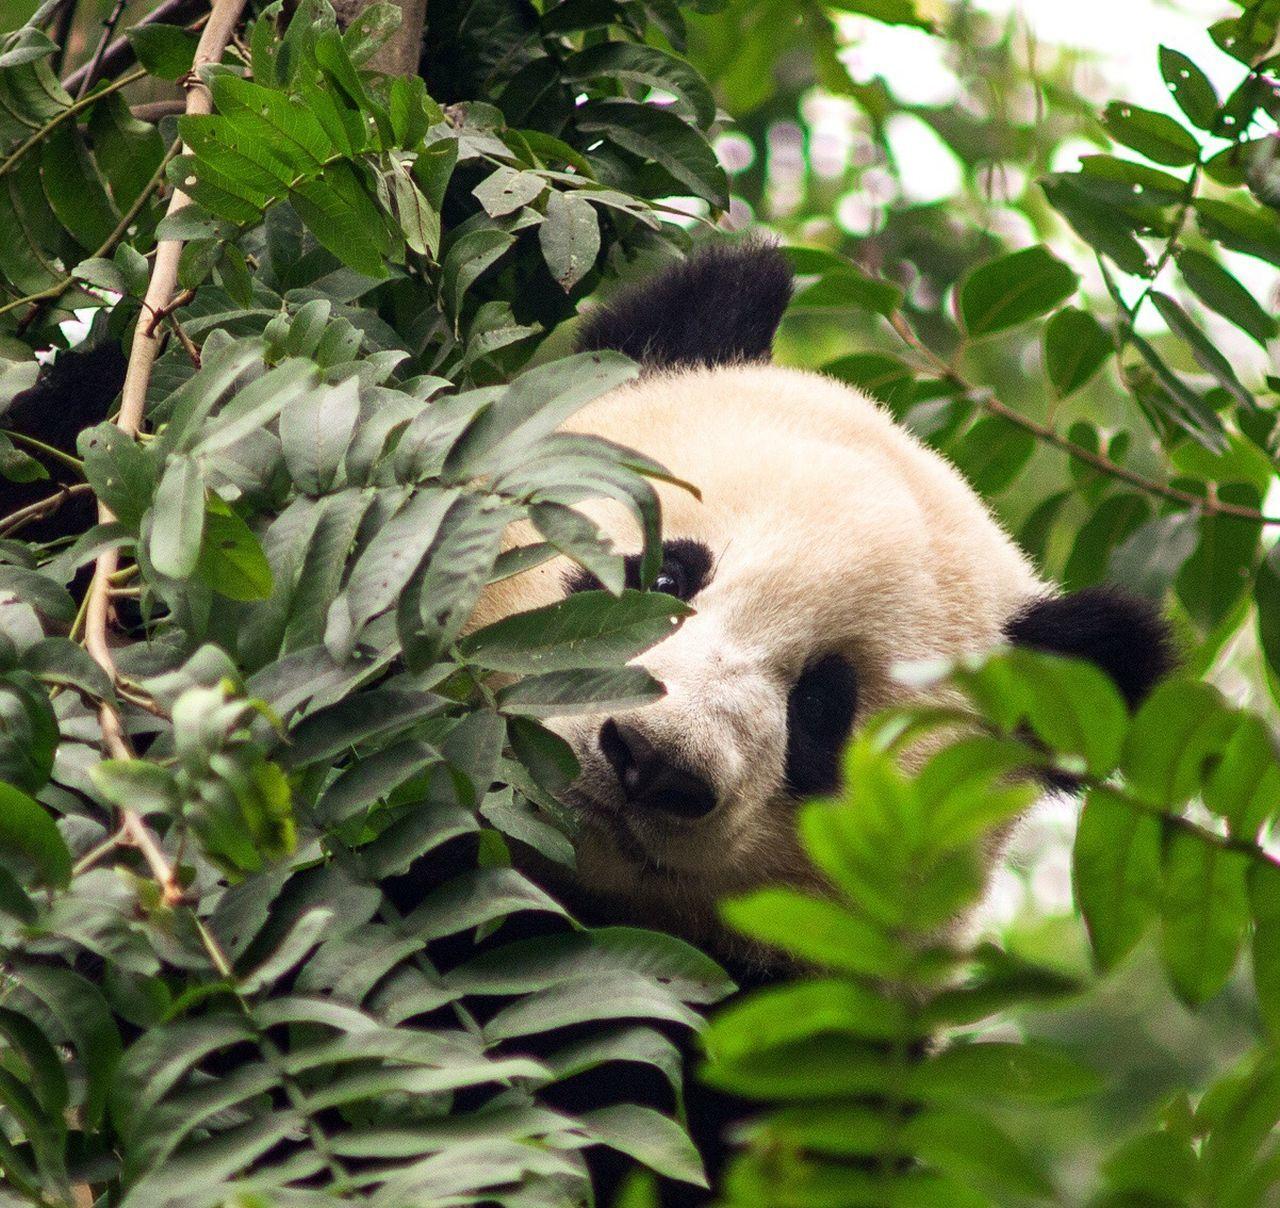 Gaint Panda Climing Tree Cuddlemonster Cute Animals Sichuan Province Chengdu